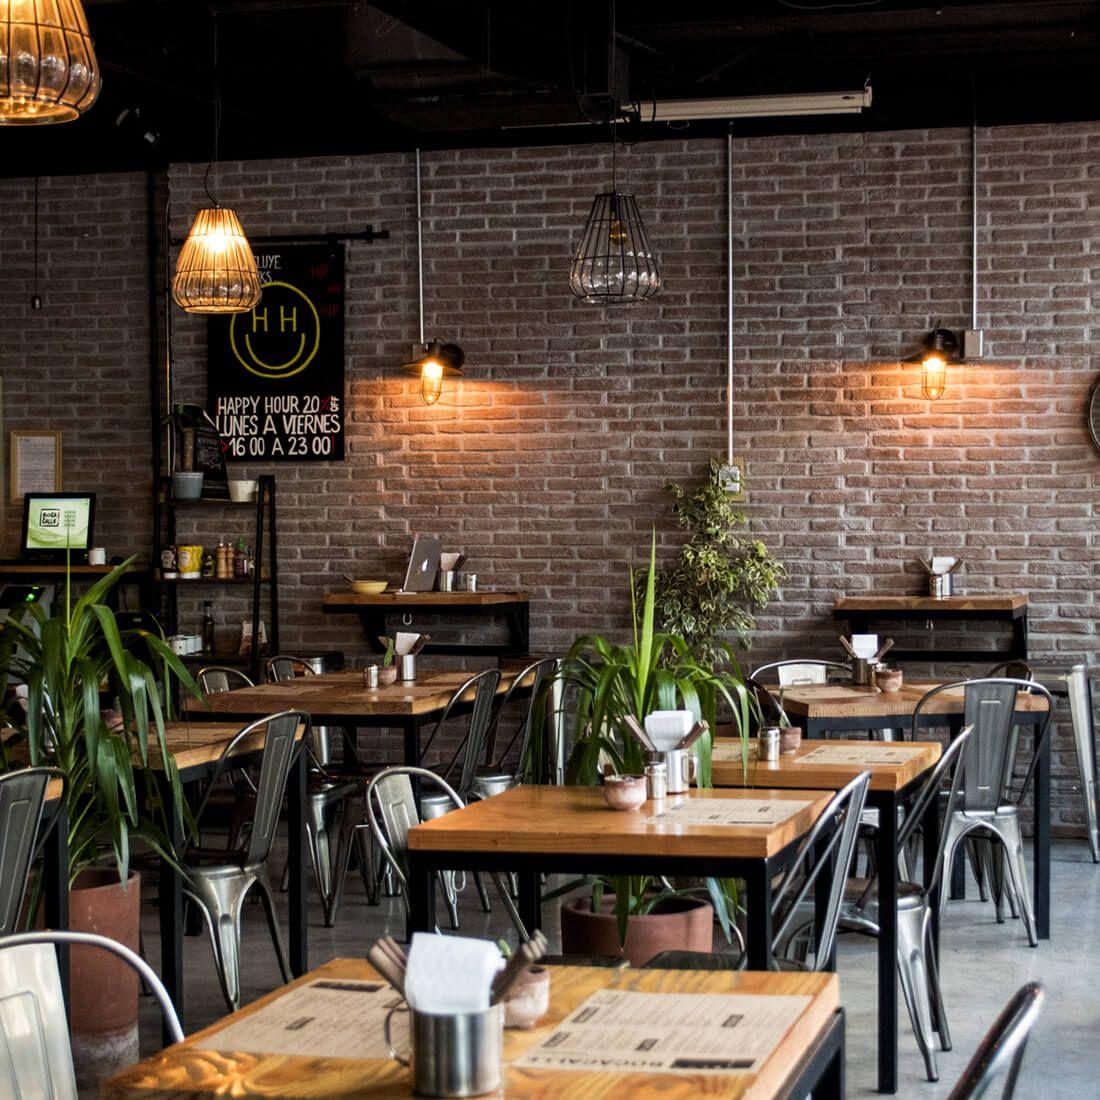 BOCACALLE Restaurante - Reserva en restaurantes de Comida HAMBURGUESA - PROVIDENCIA - MESA 24/7 | SANTIAGO - Perú